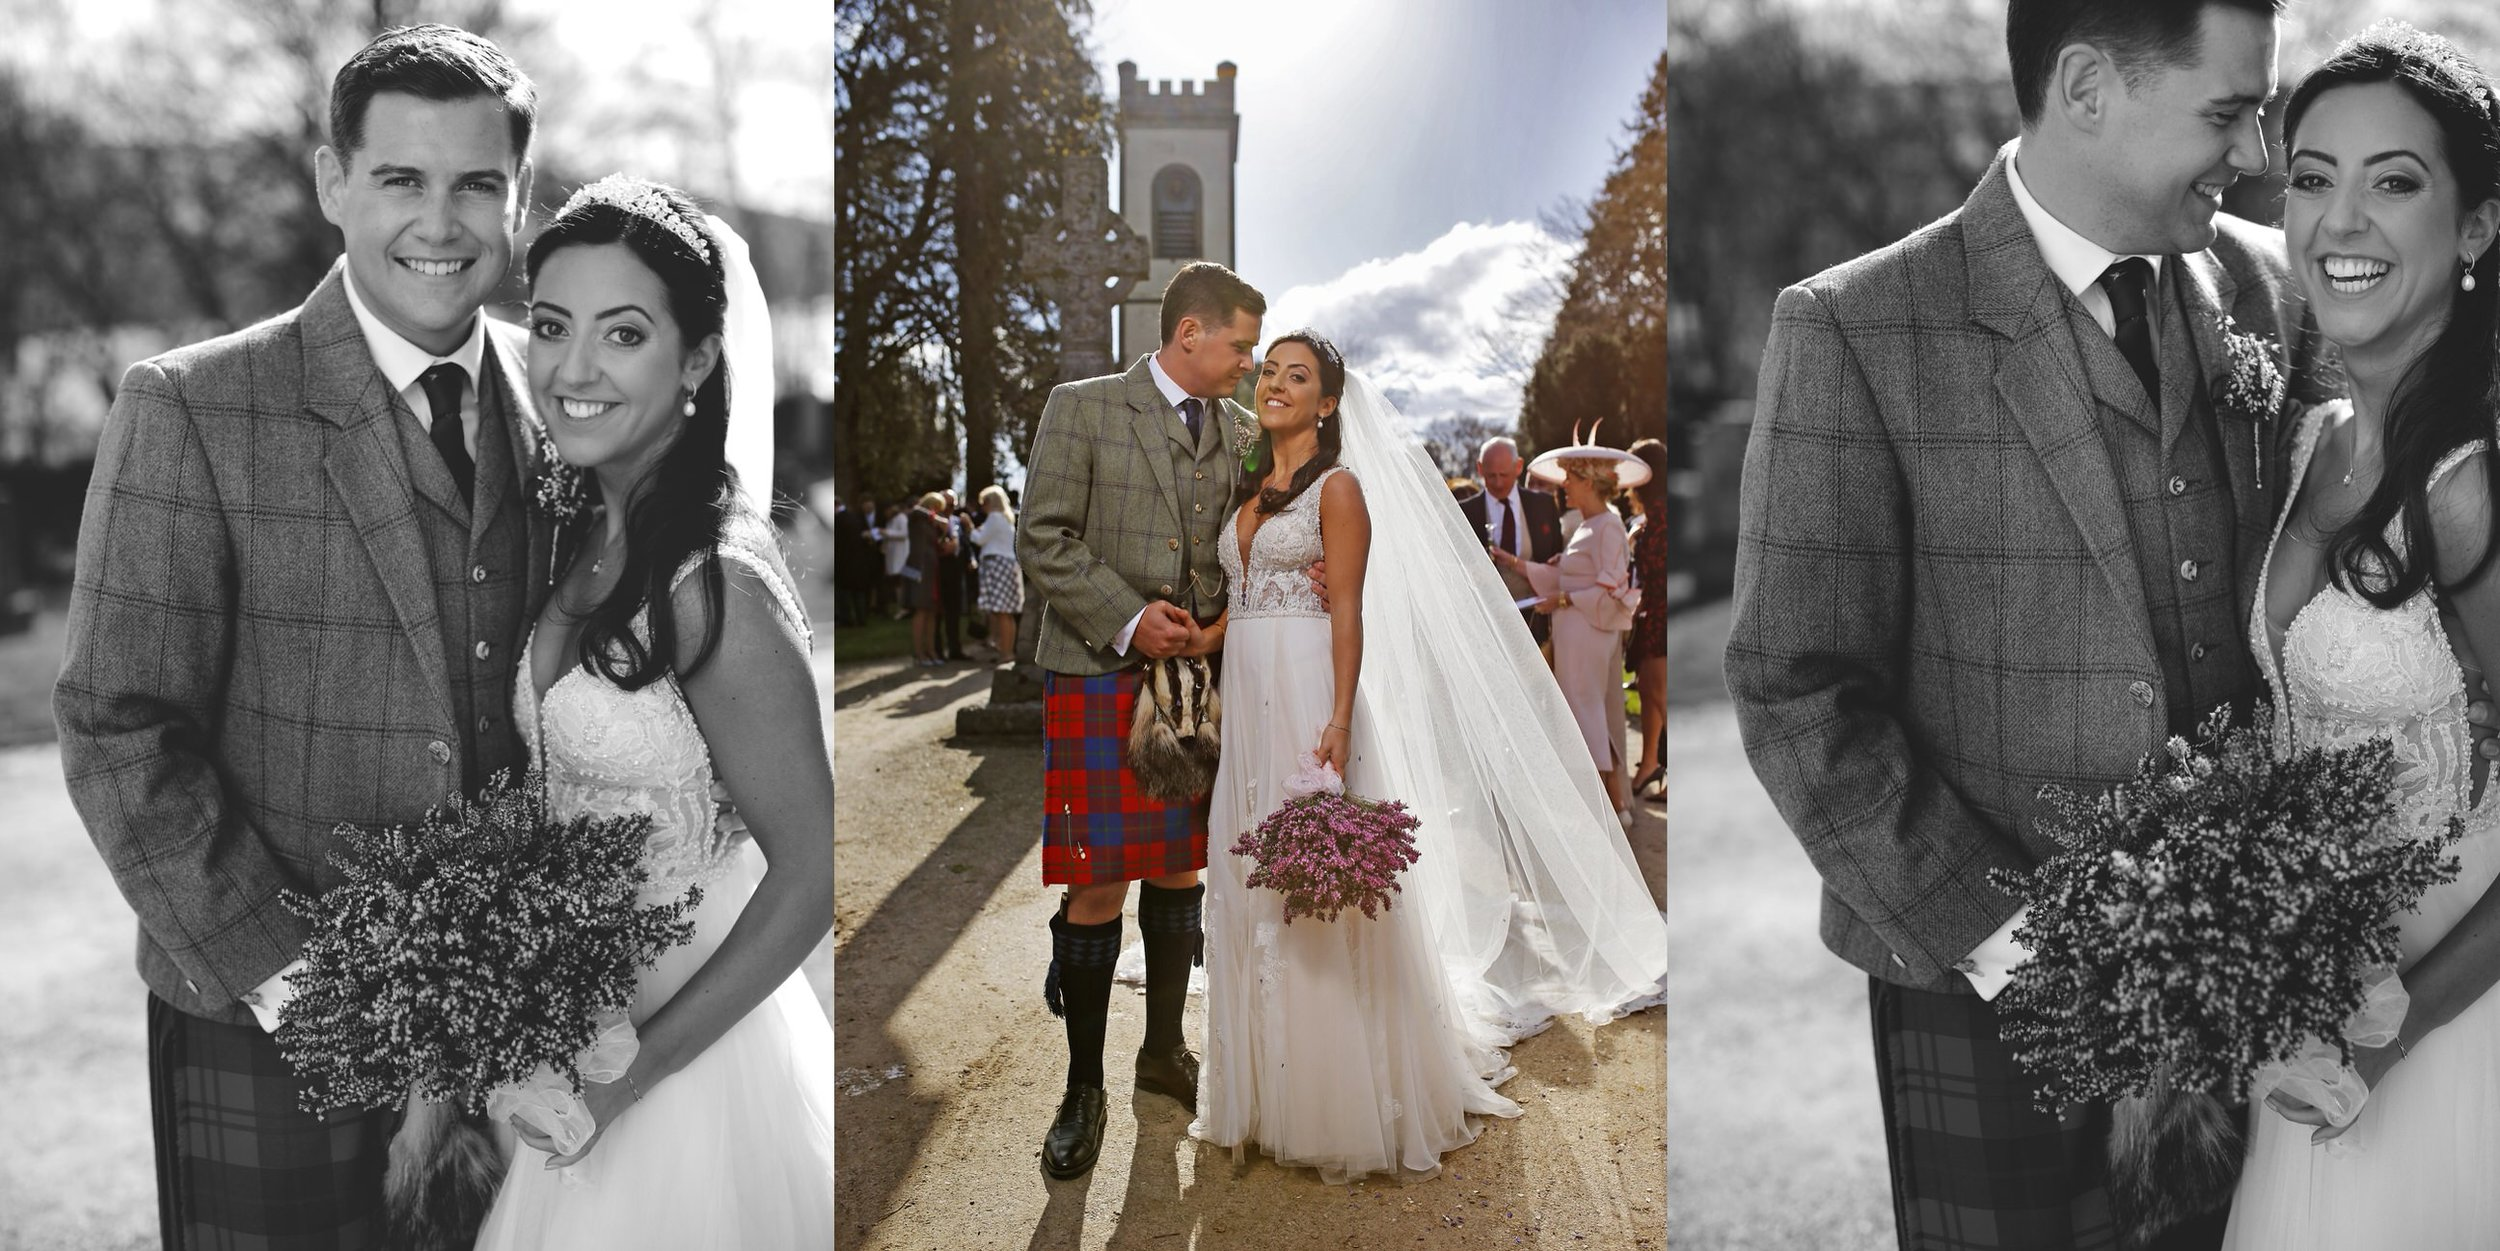 brett-harkness-cotland-wedding-photographer-highland-wedding_0019.jpg